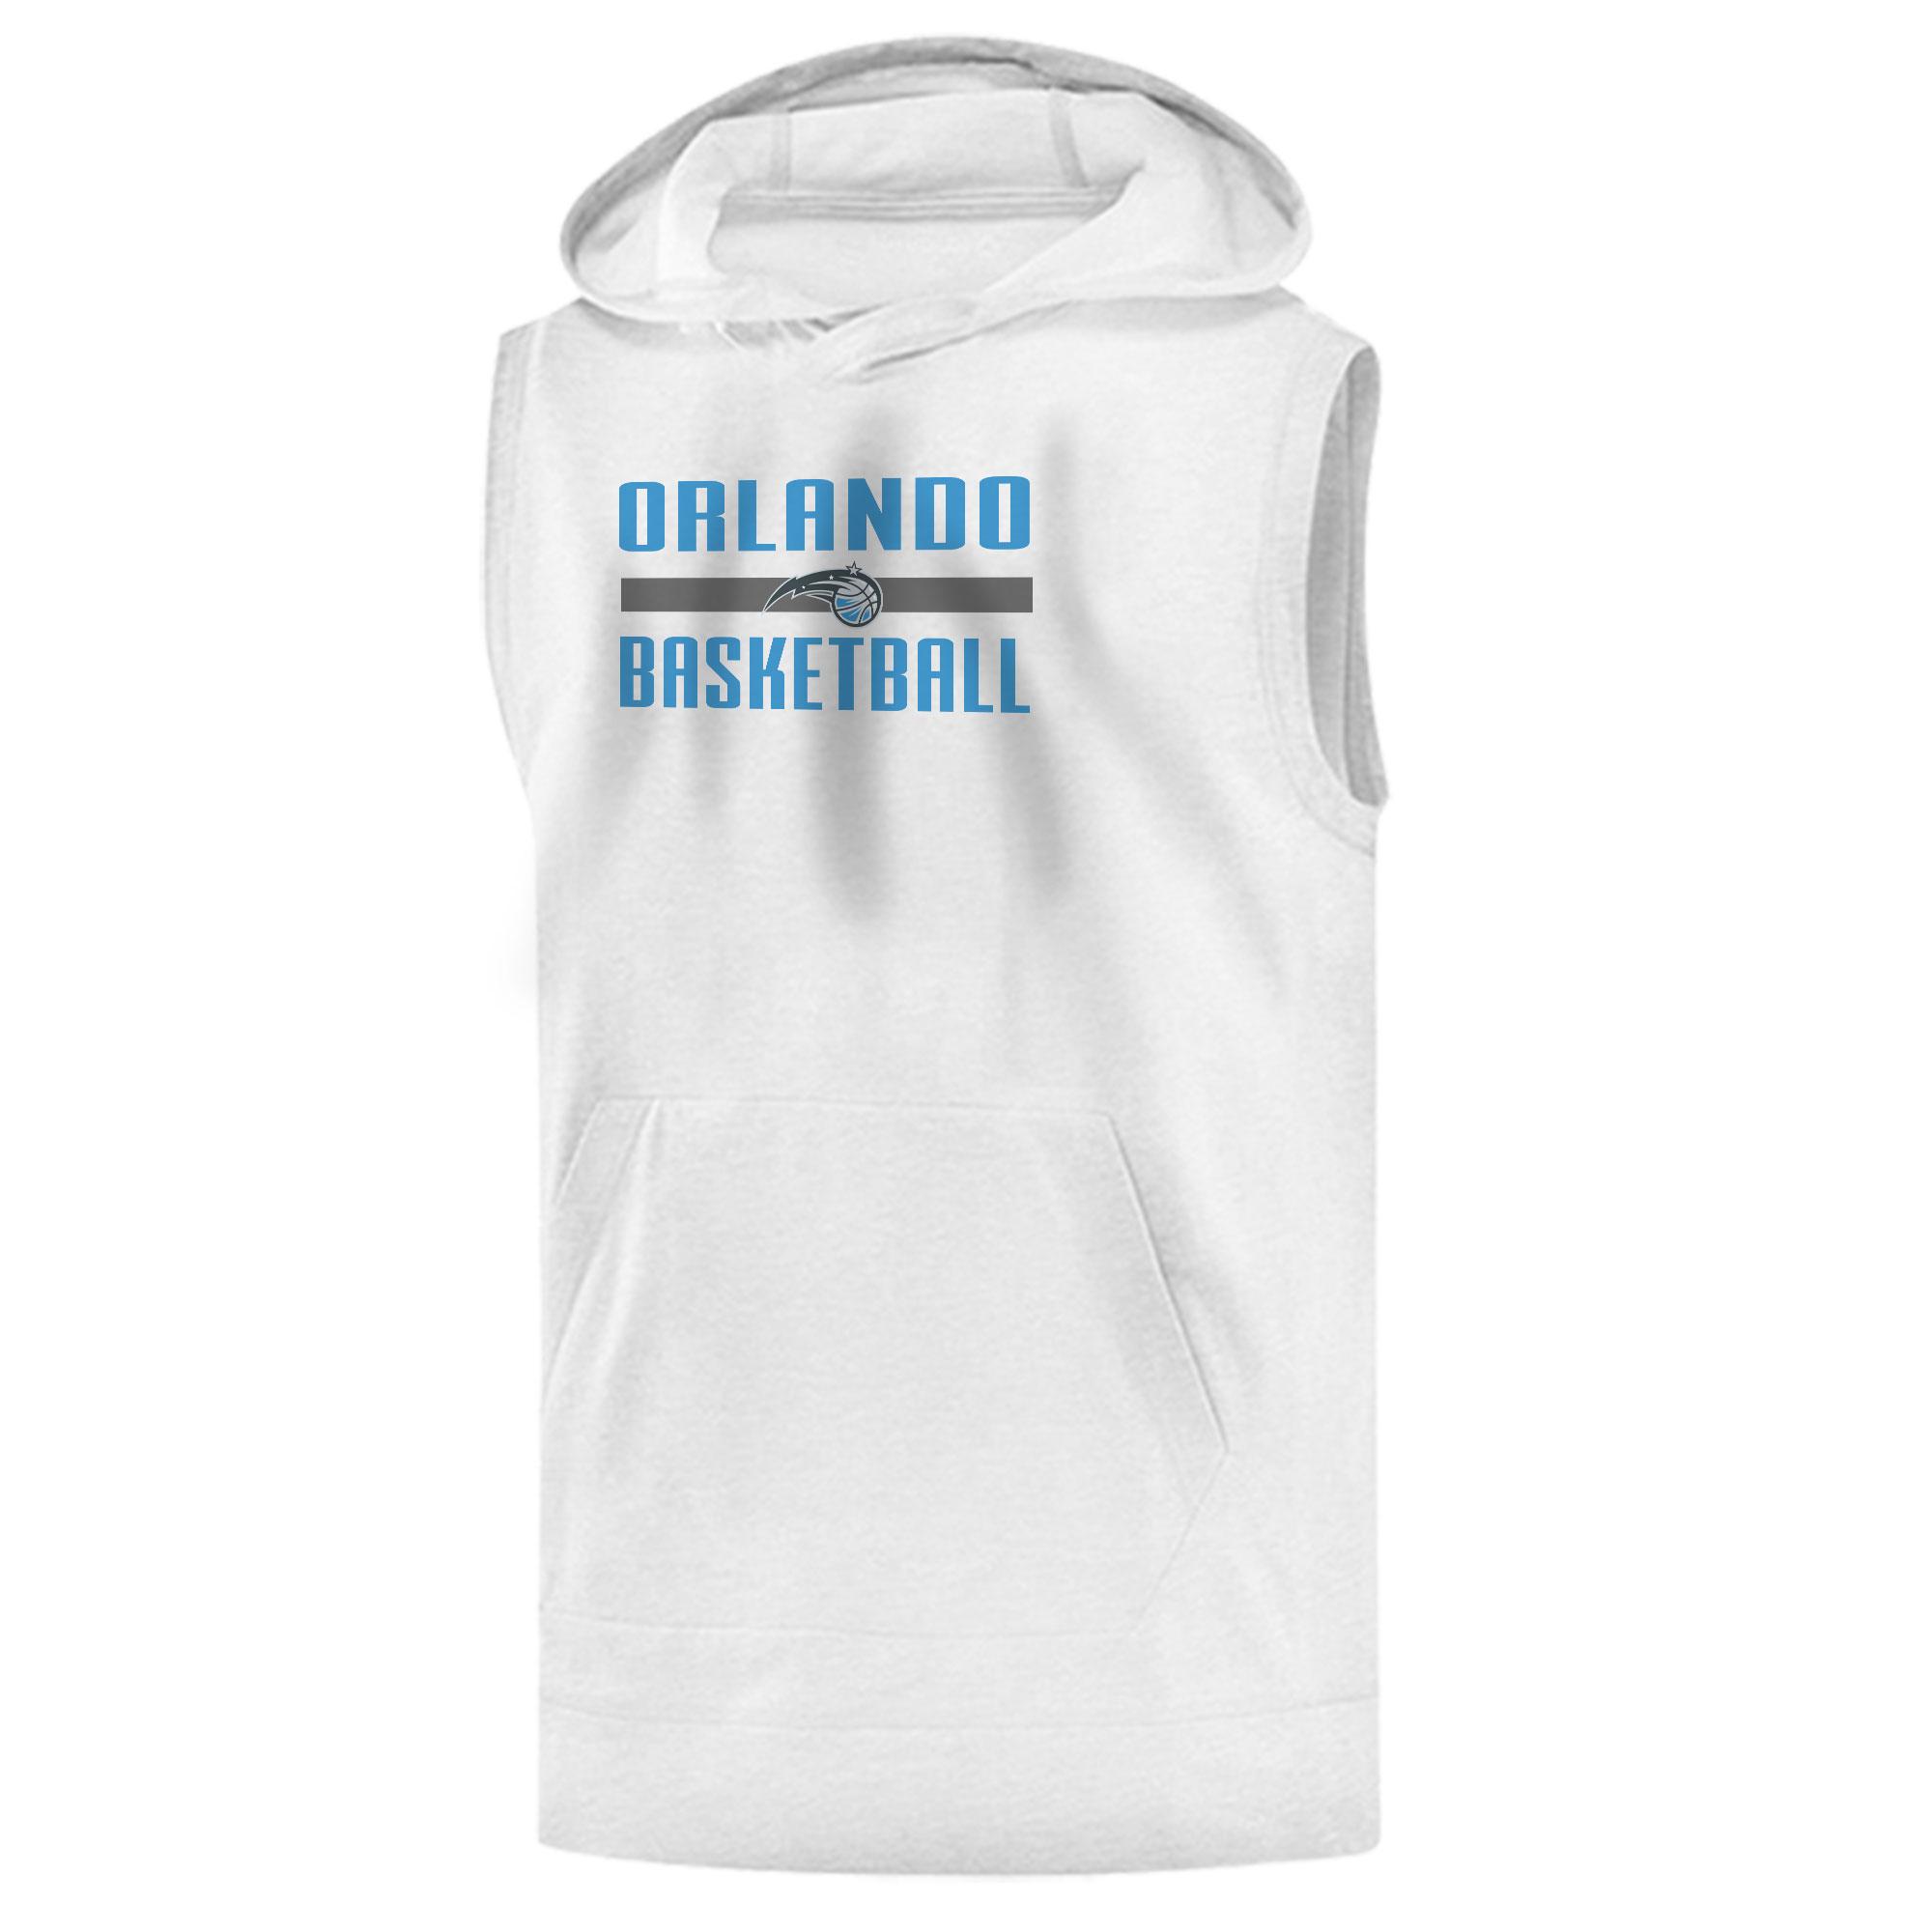 Orlando Magic Basketball Sleeveless (KLS-WHT-442-orl.bsktbll)